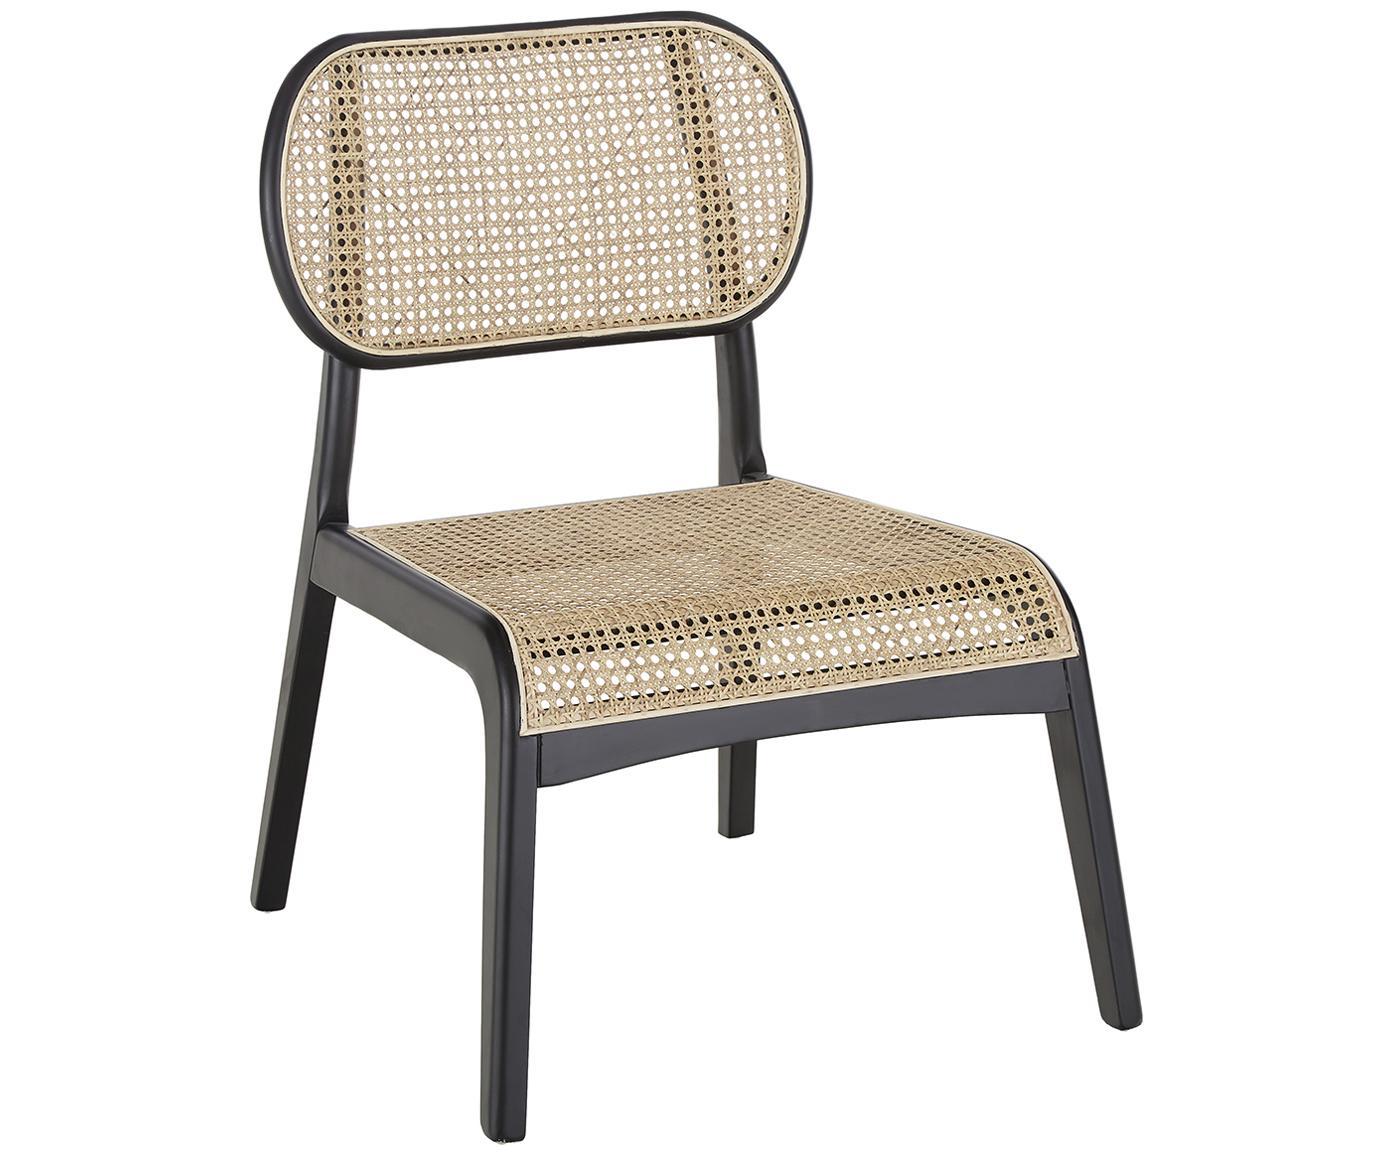 Loungesessel Franz mit Wiener Geflecht, Sitzfläche: Rattan, Gestell: Massives Birkenholz, lack, Sitzfläche: RattanGestell: Birkenholz, schwarz lackiert, B 61 x T 63 cm